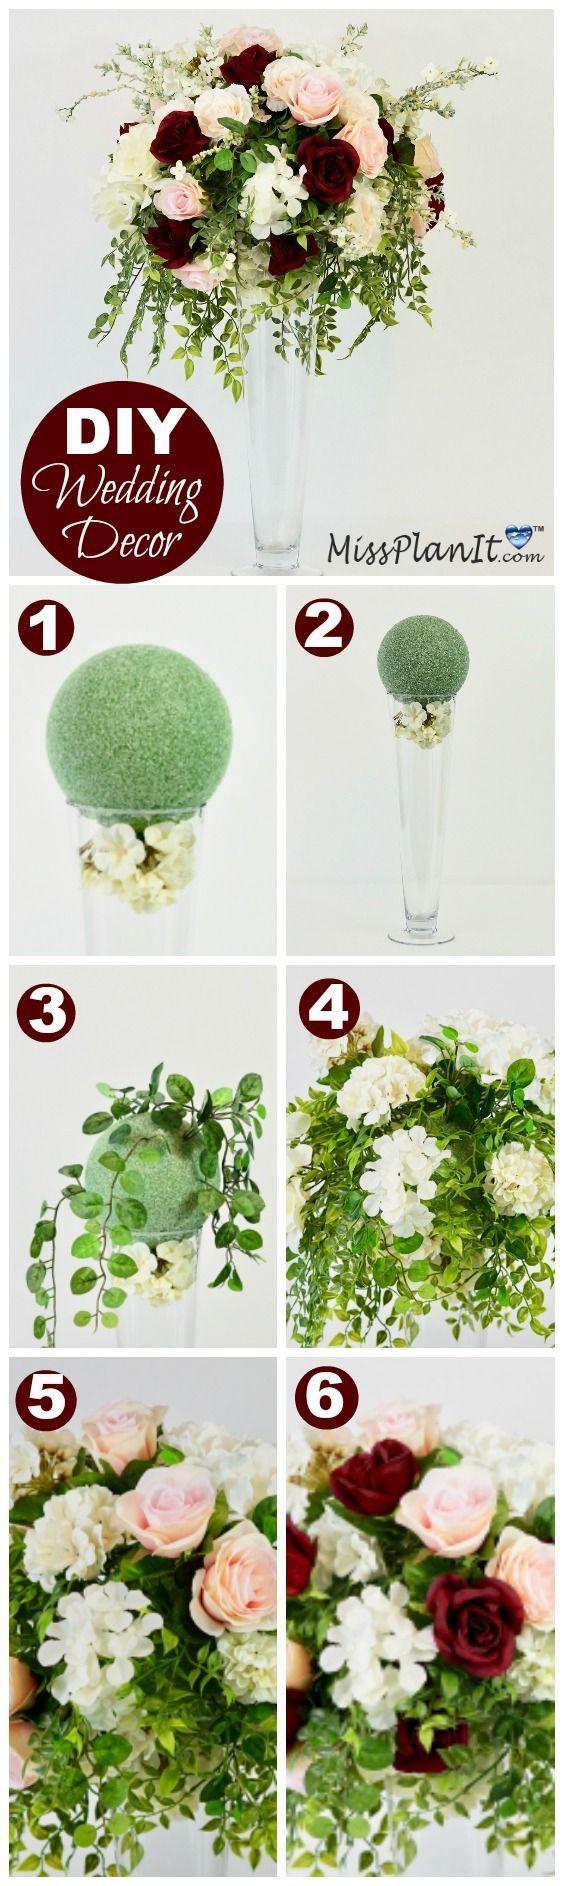 DIY Tall Romantic Rose Blush and Burgundy Wedding ceremony Centerpiece